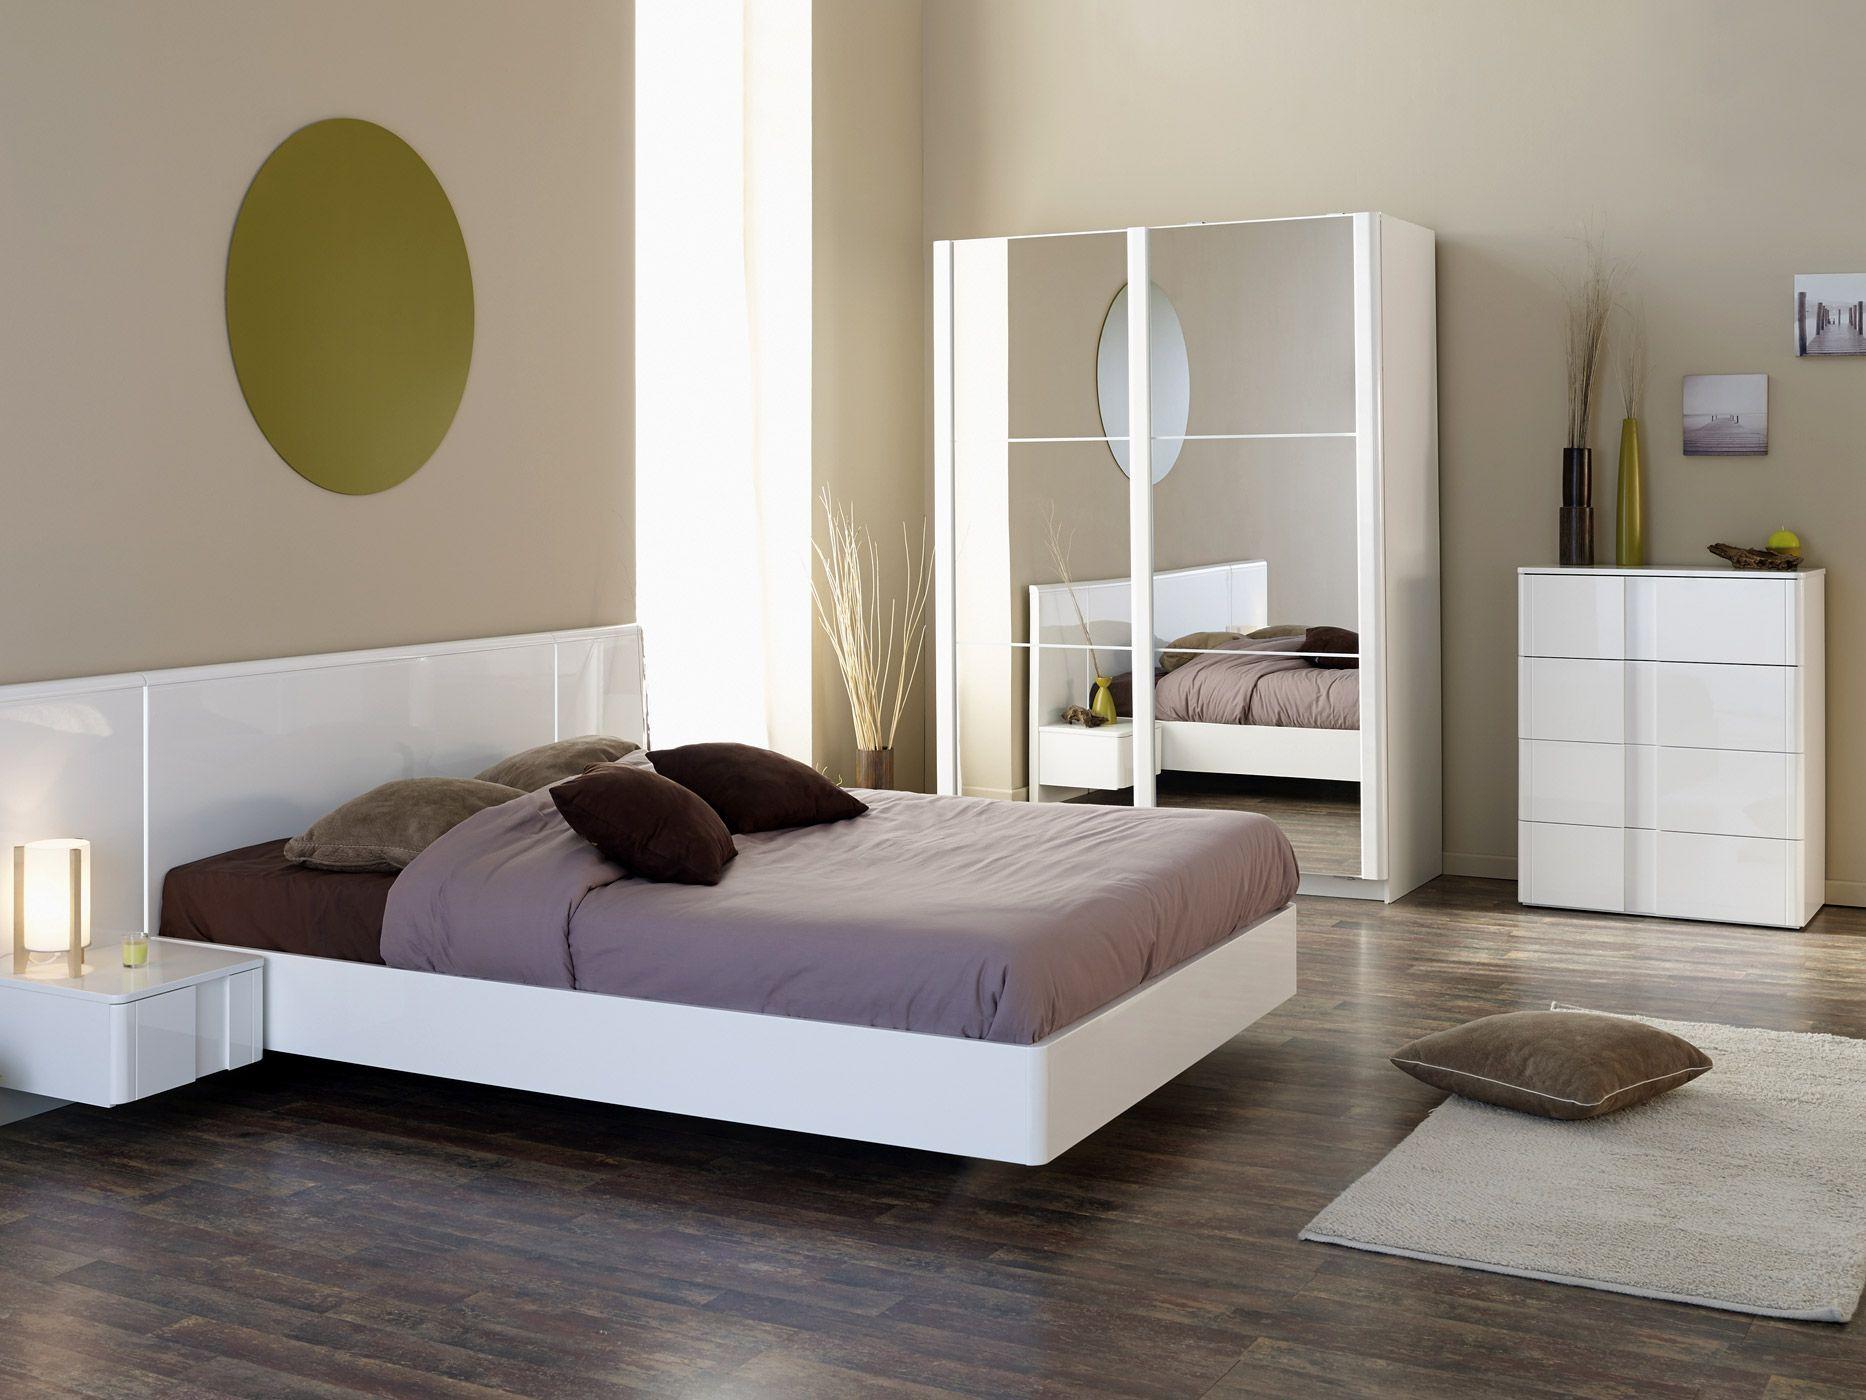 Wit en modern gaan hand in hand uige slaapkamer Wesley bestaande uit tweepersoonsbed nachtkastje